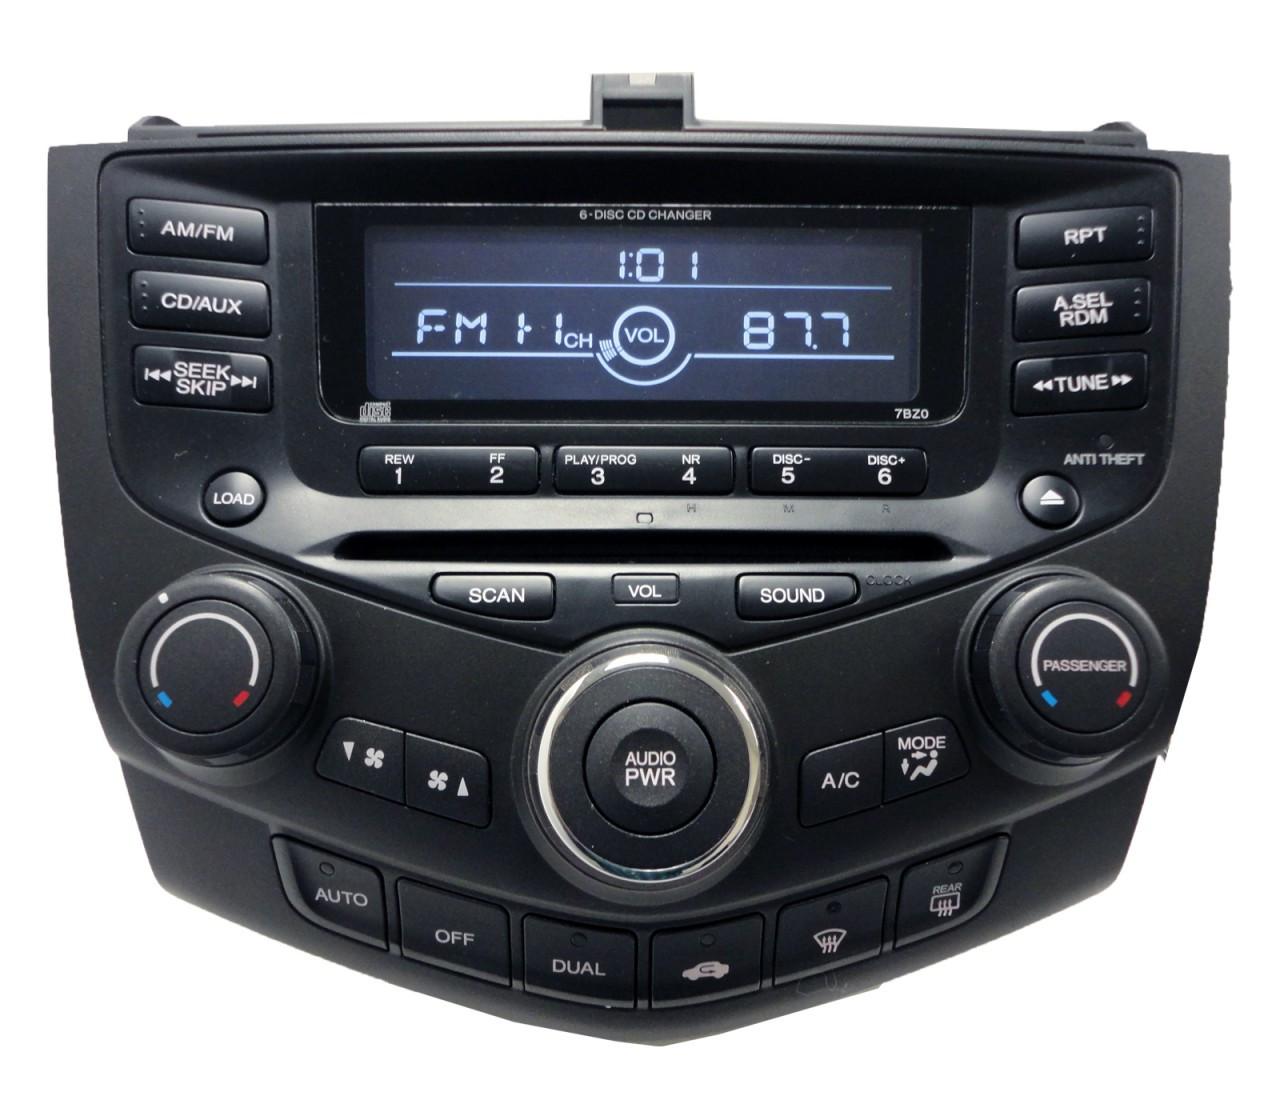 7BZ0 Honda Accord EX L Radio AUX MP3 Player 6 CD Changer